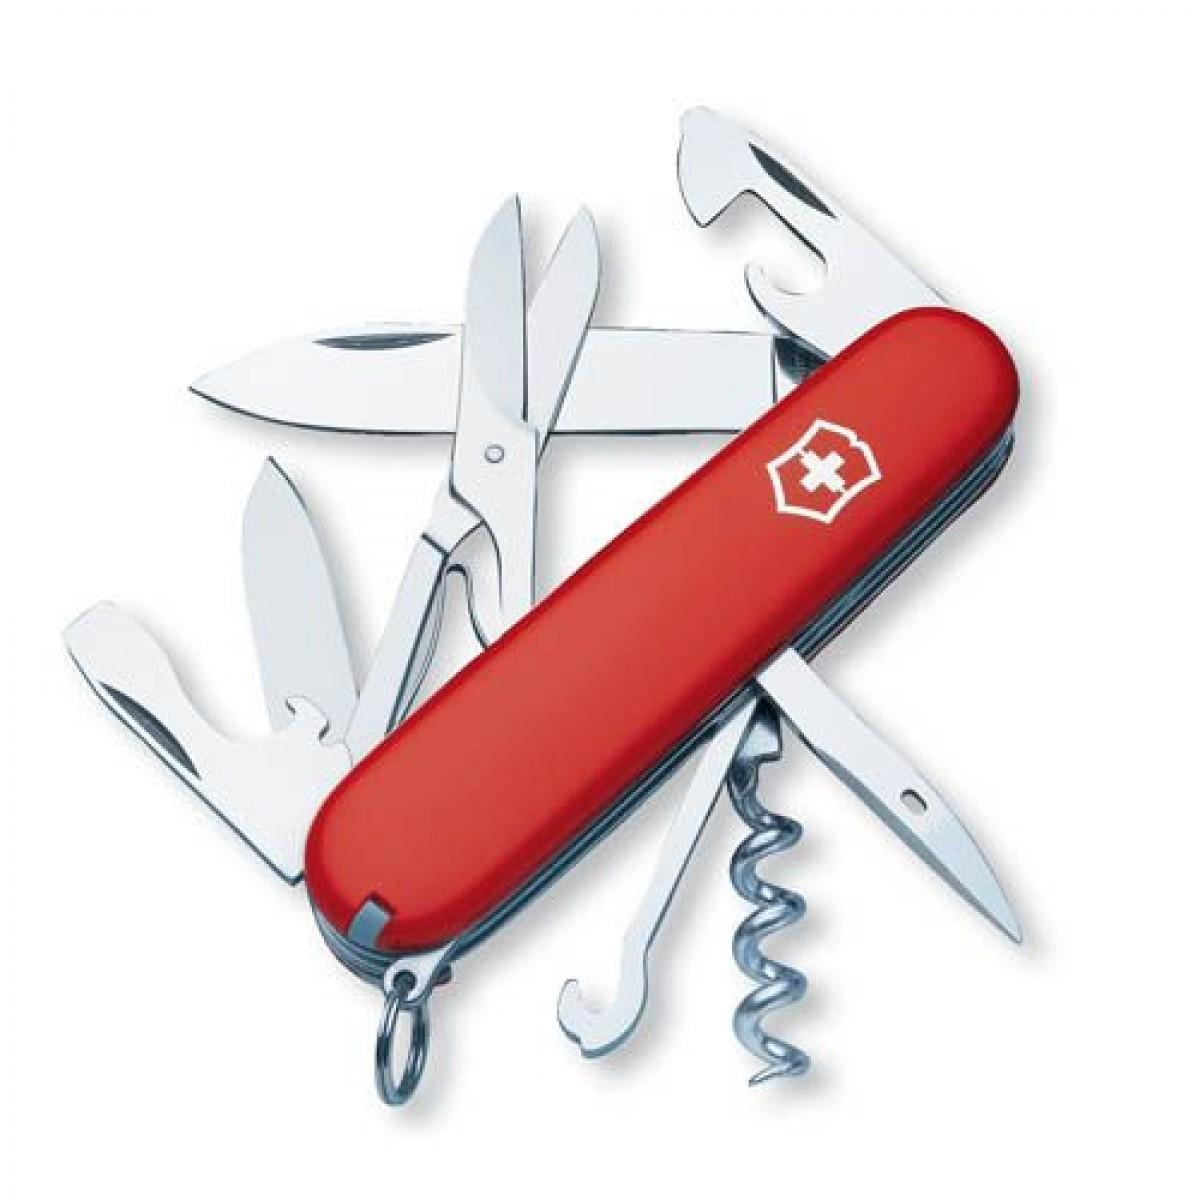 Victorinox Climber Knife Victorinox Climber Knife